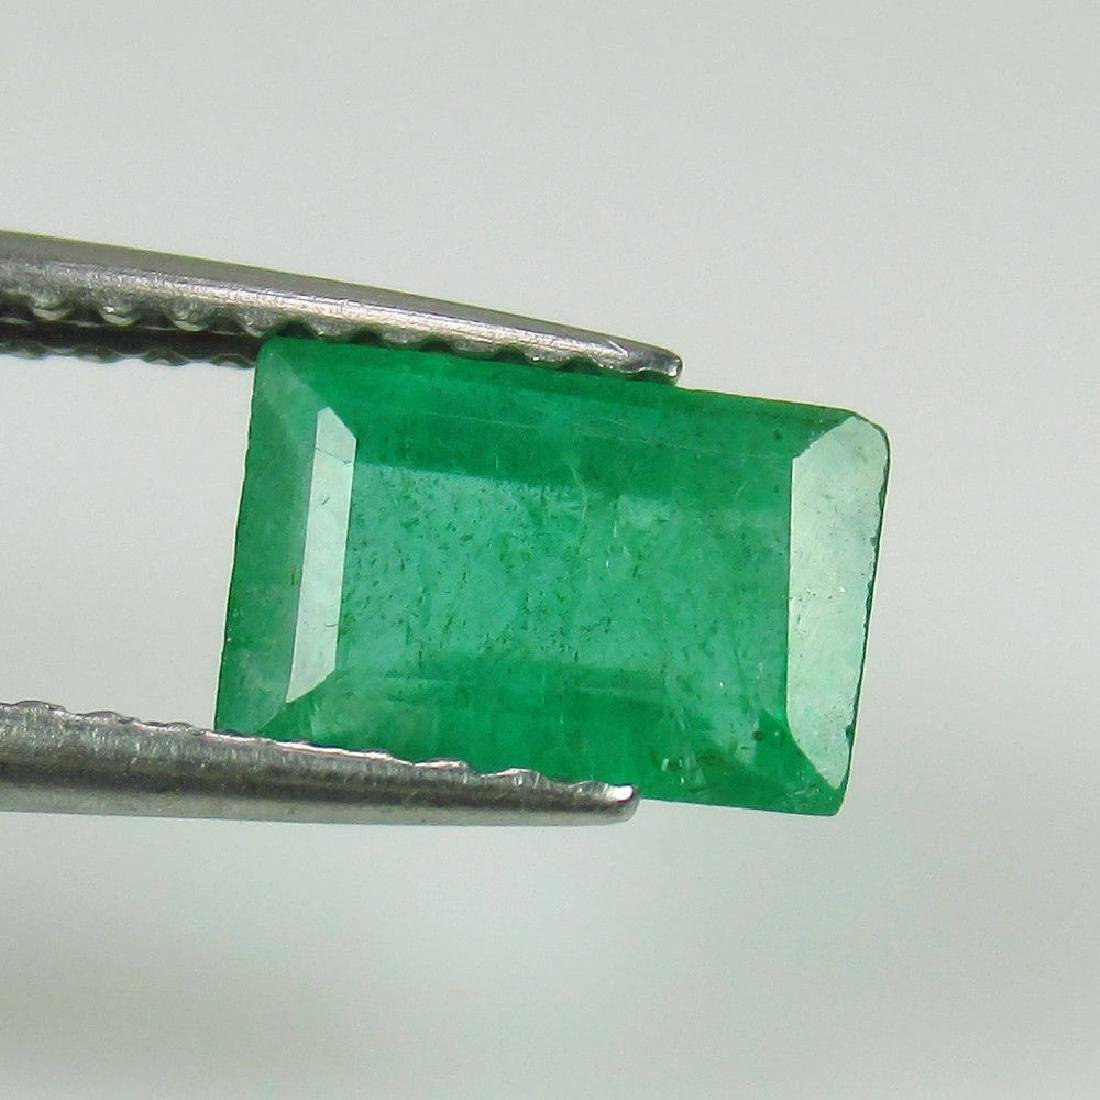 1.19 Ct Genuine Zambian Emerald 7.5x5 mm Oval Cut